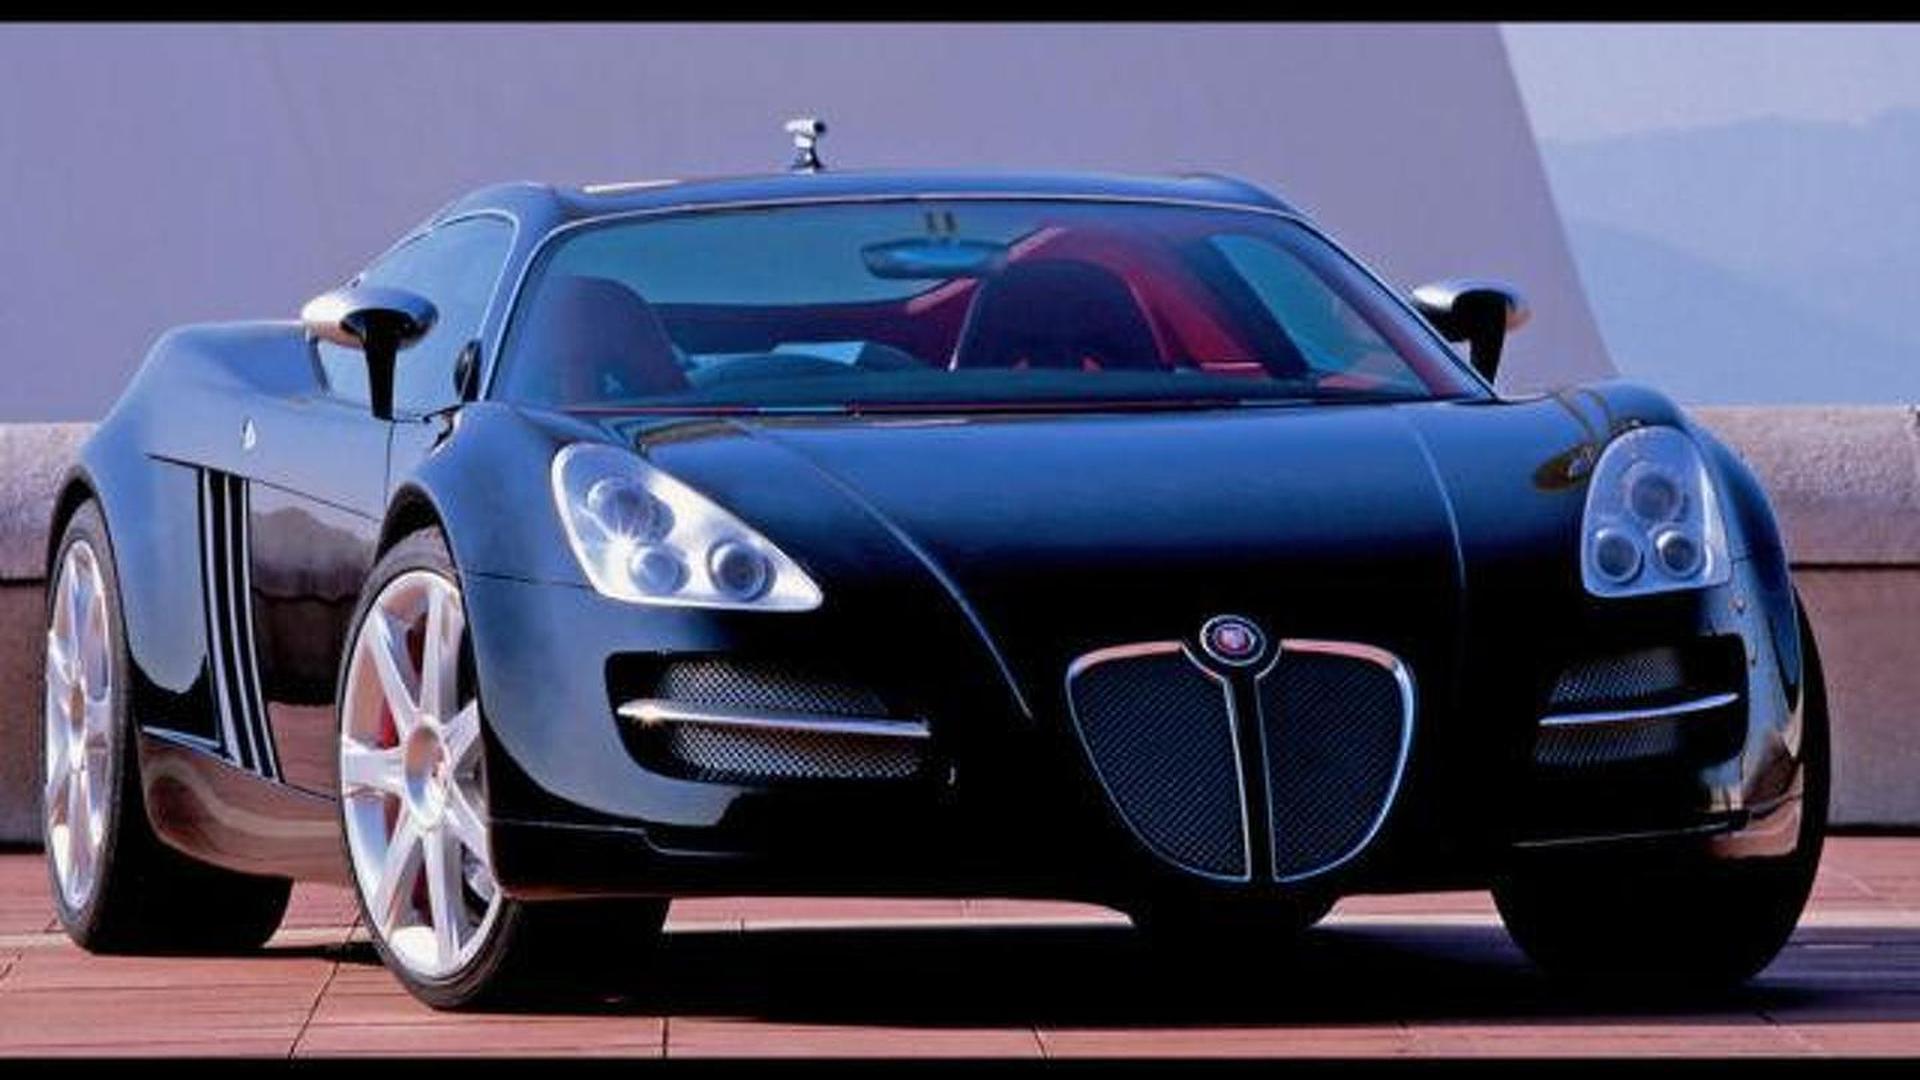 trade classifieds southeast private for jaguar sale full fs forums xjr left buy forum